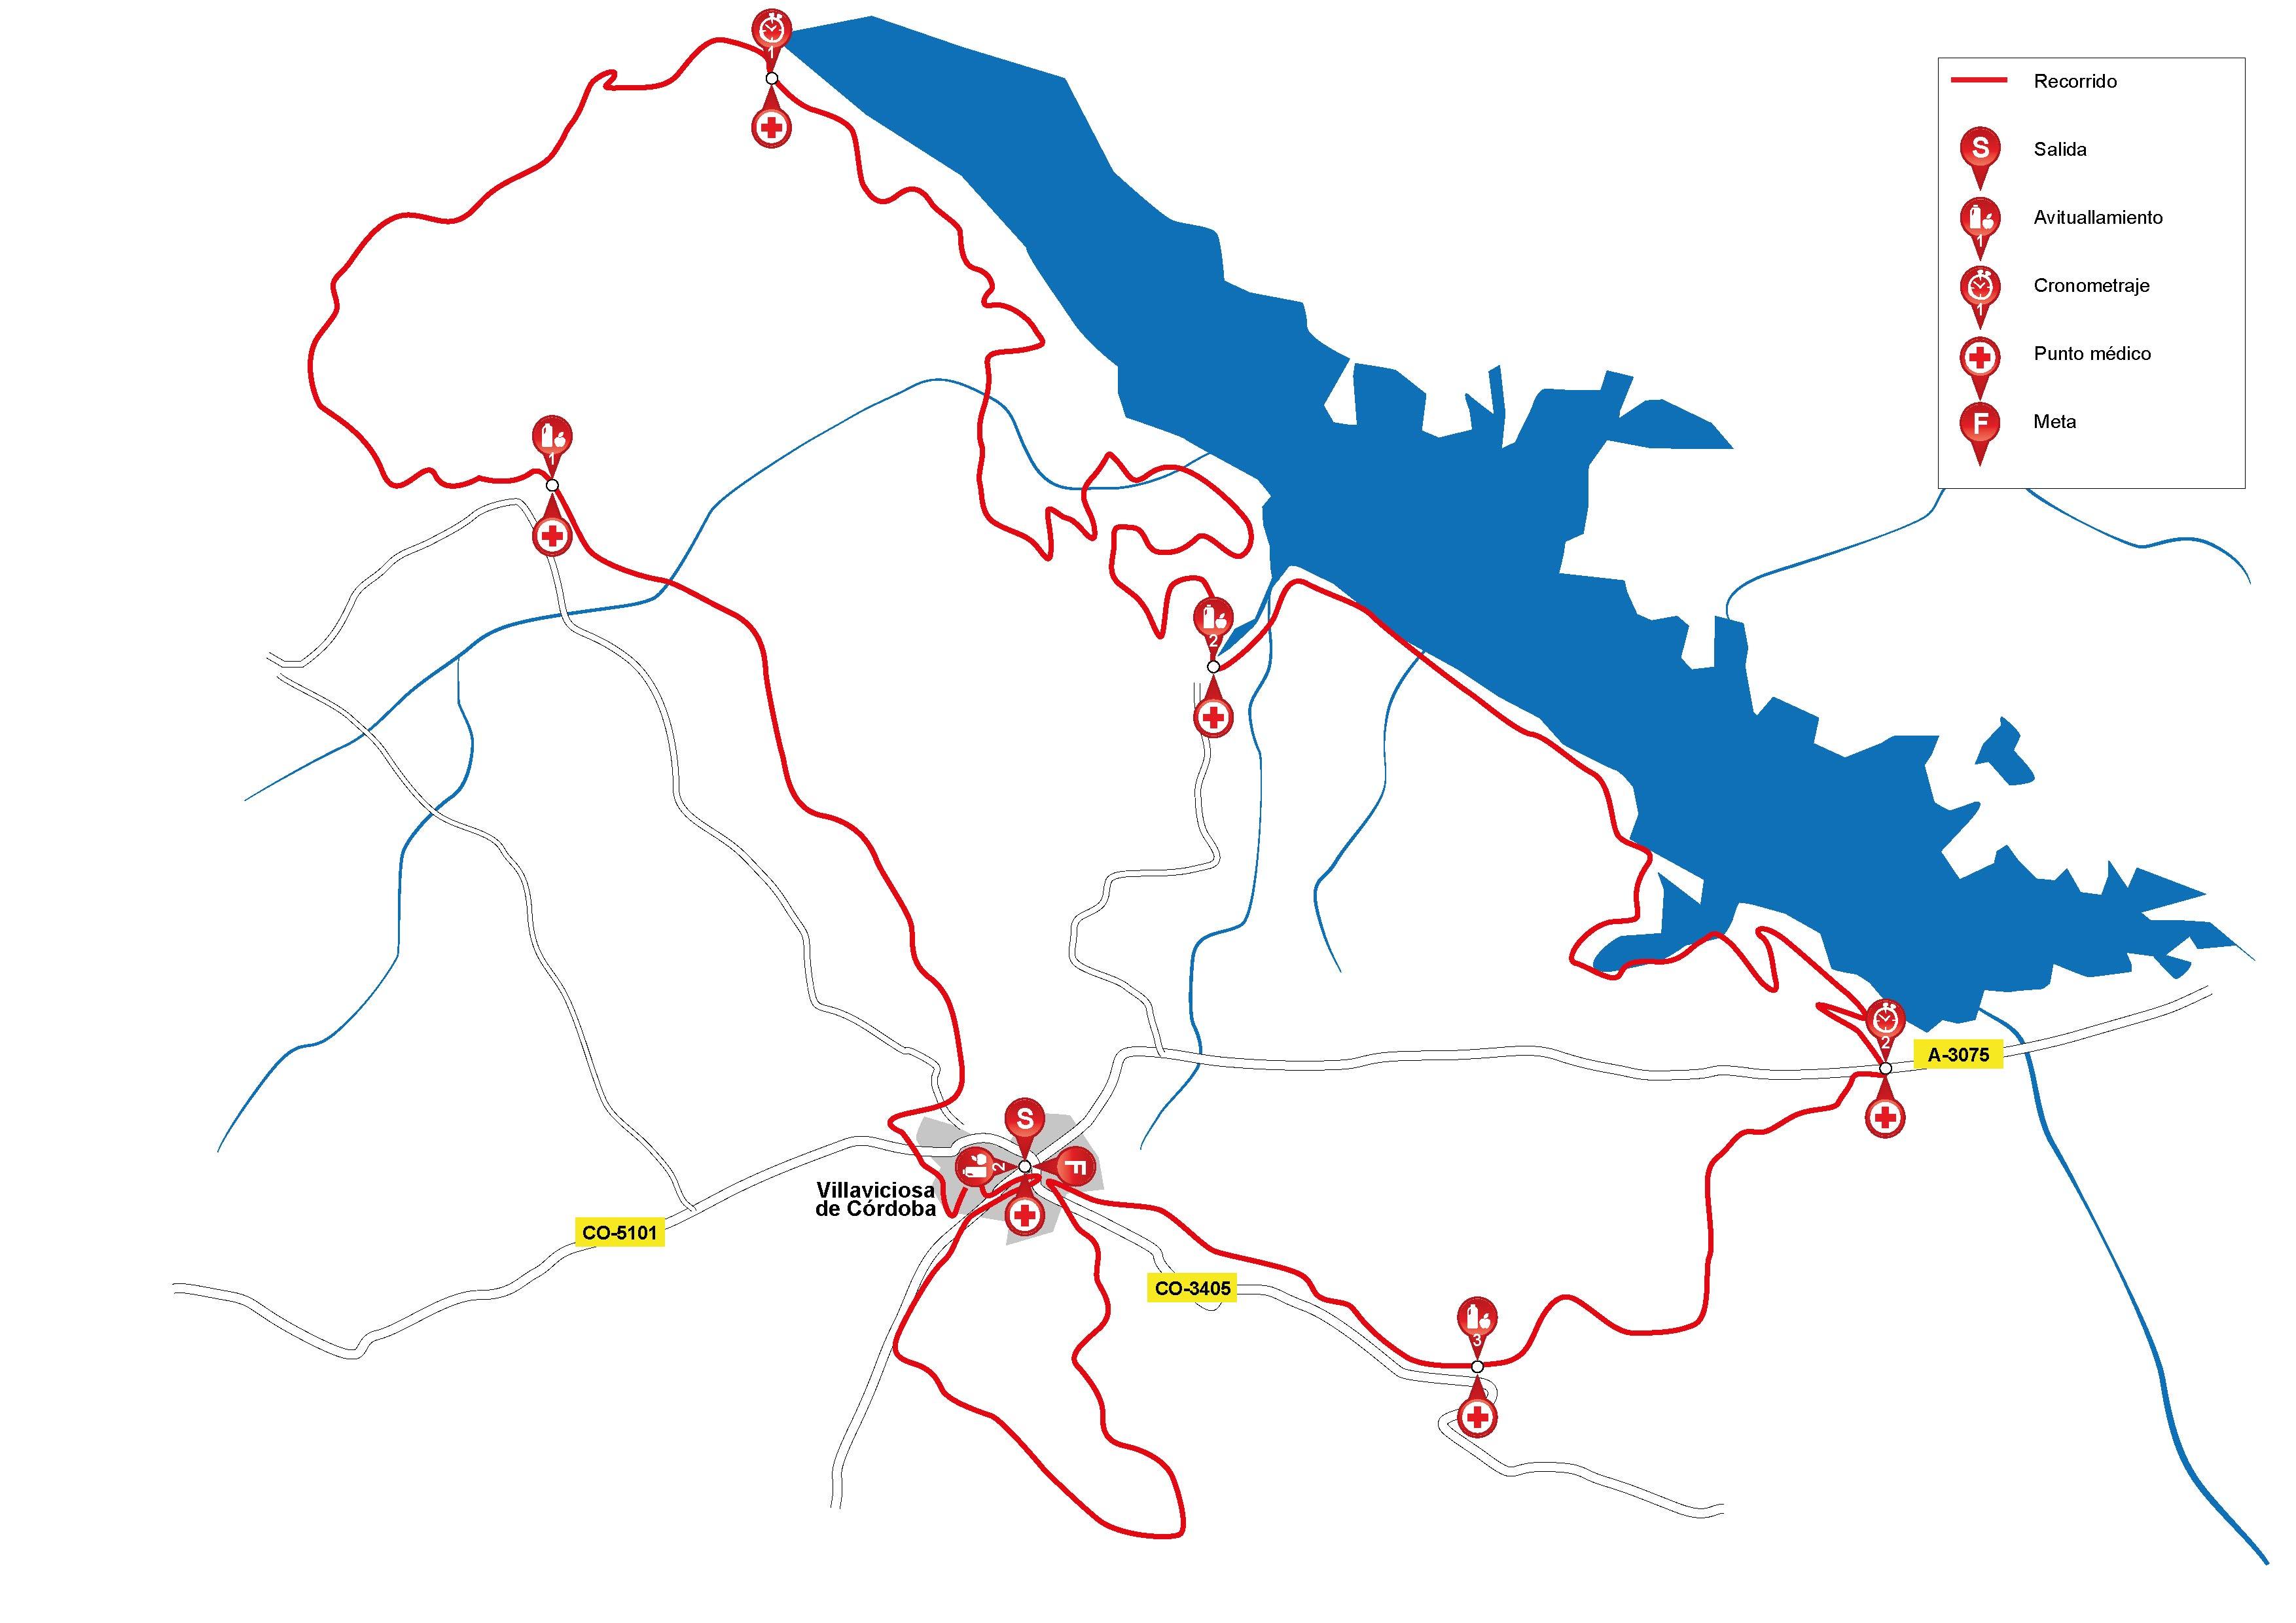 etapa 5 Andalucía bike race perfil